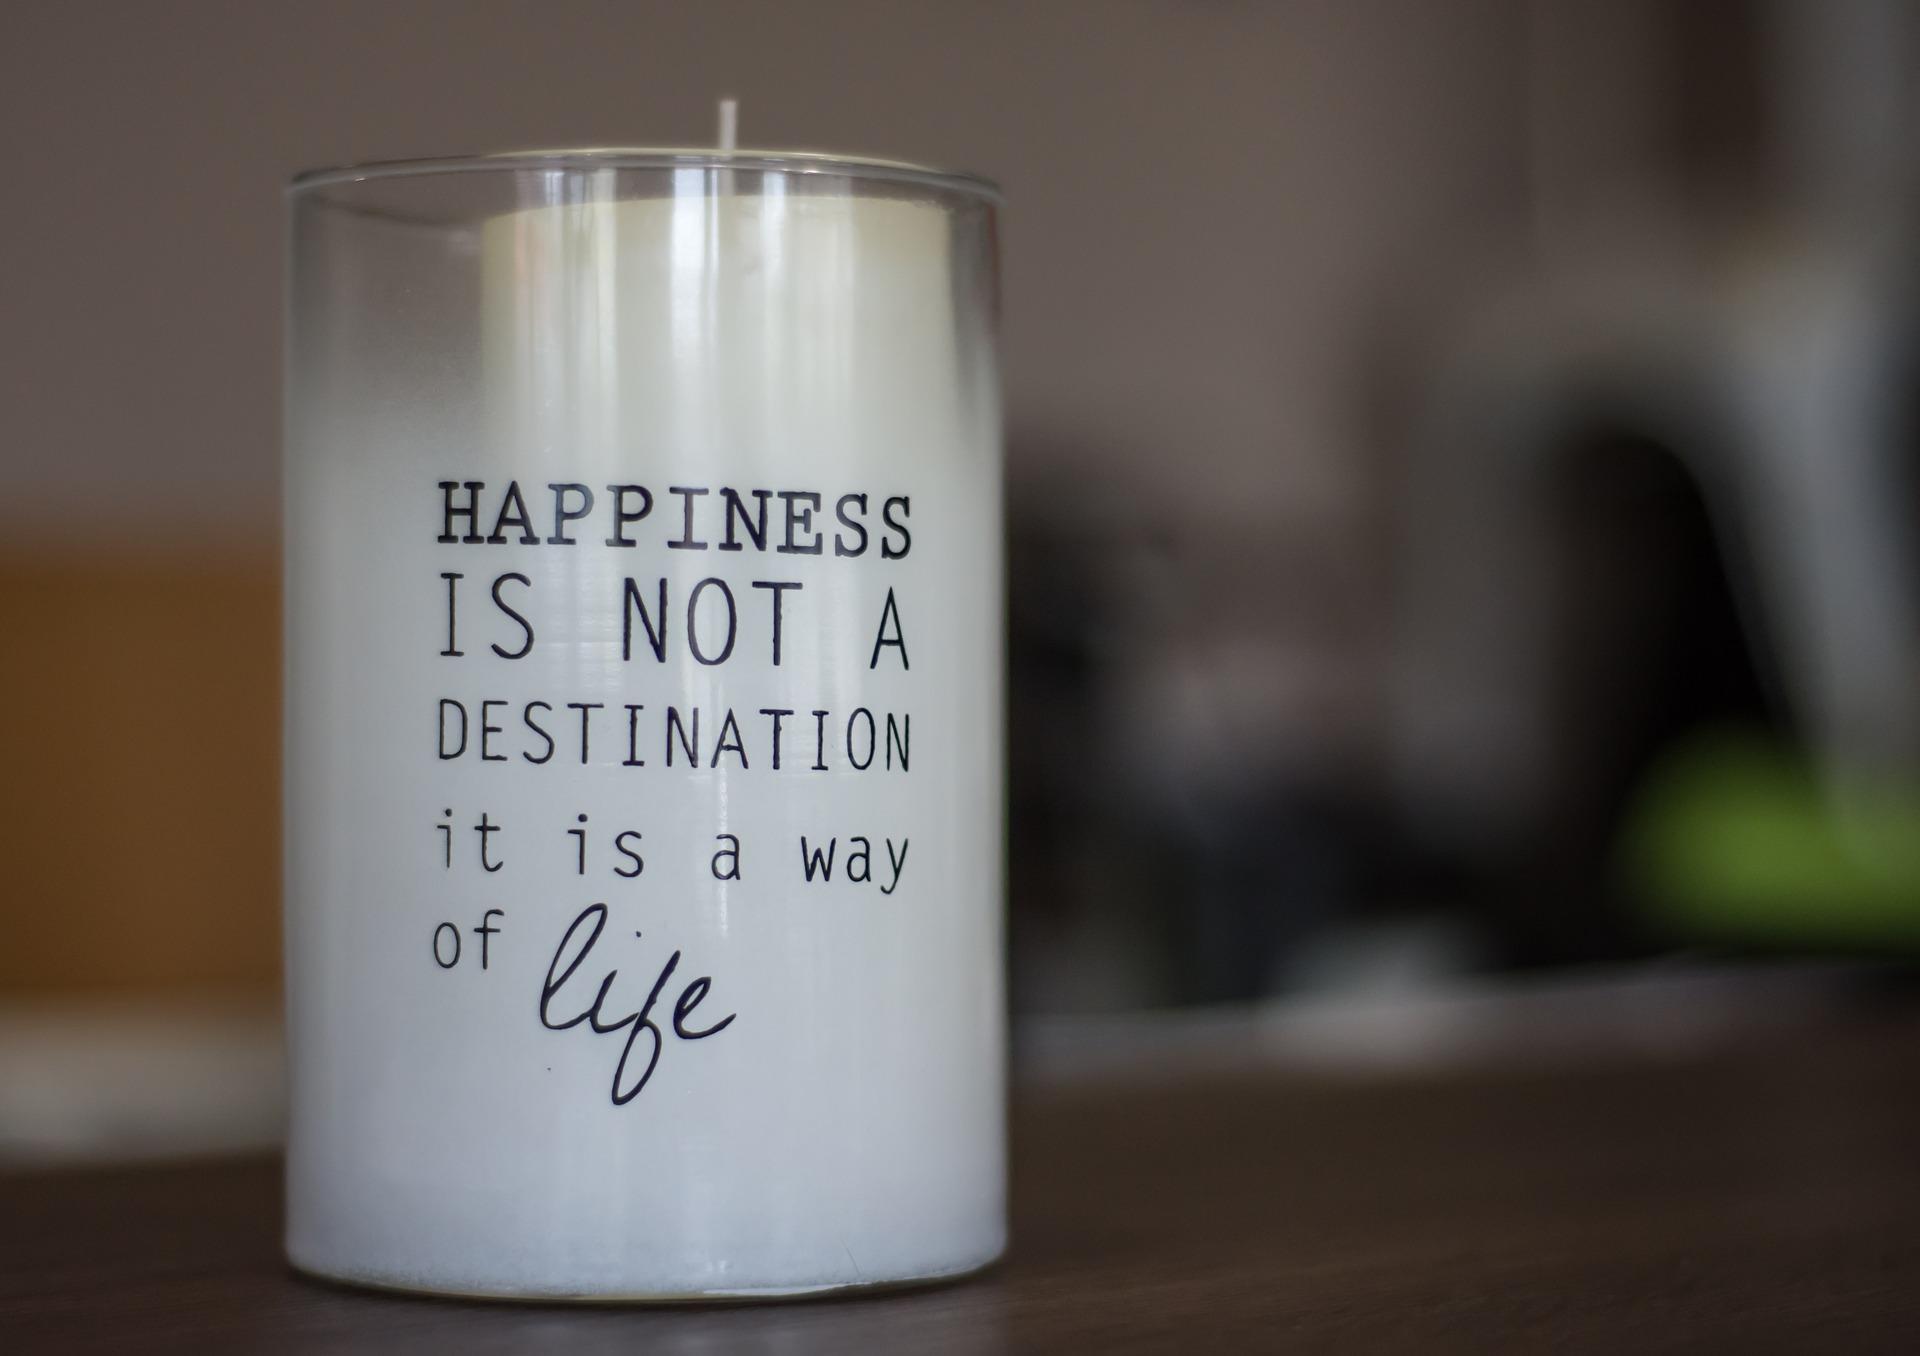 Verse Inscribed Candle Jars